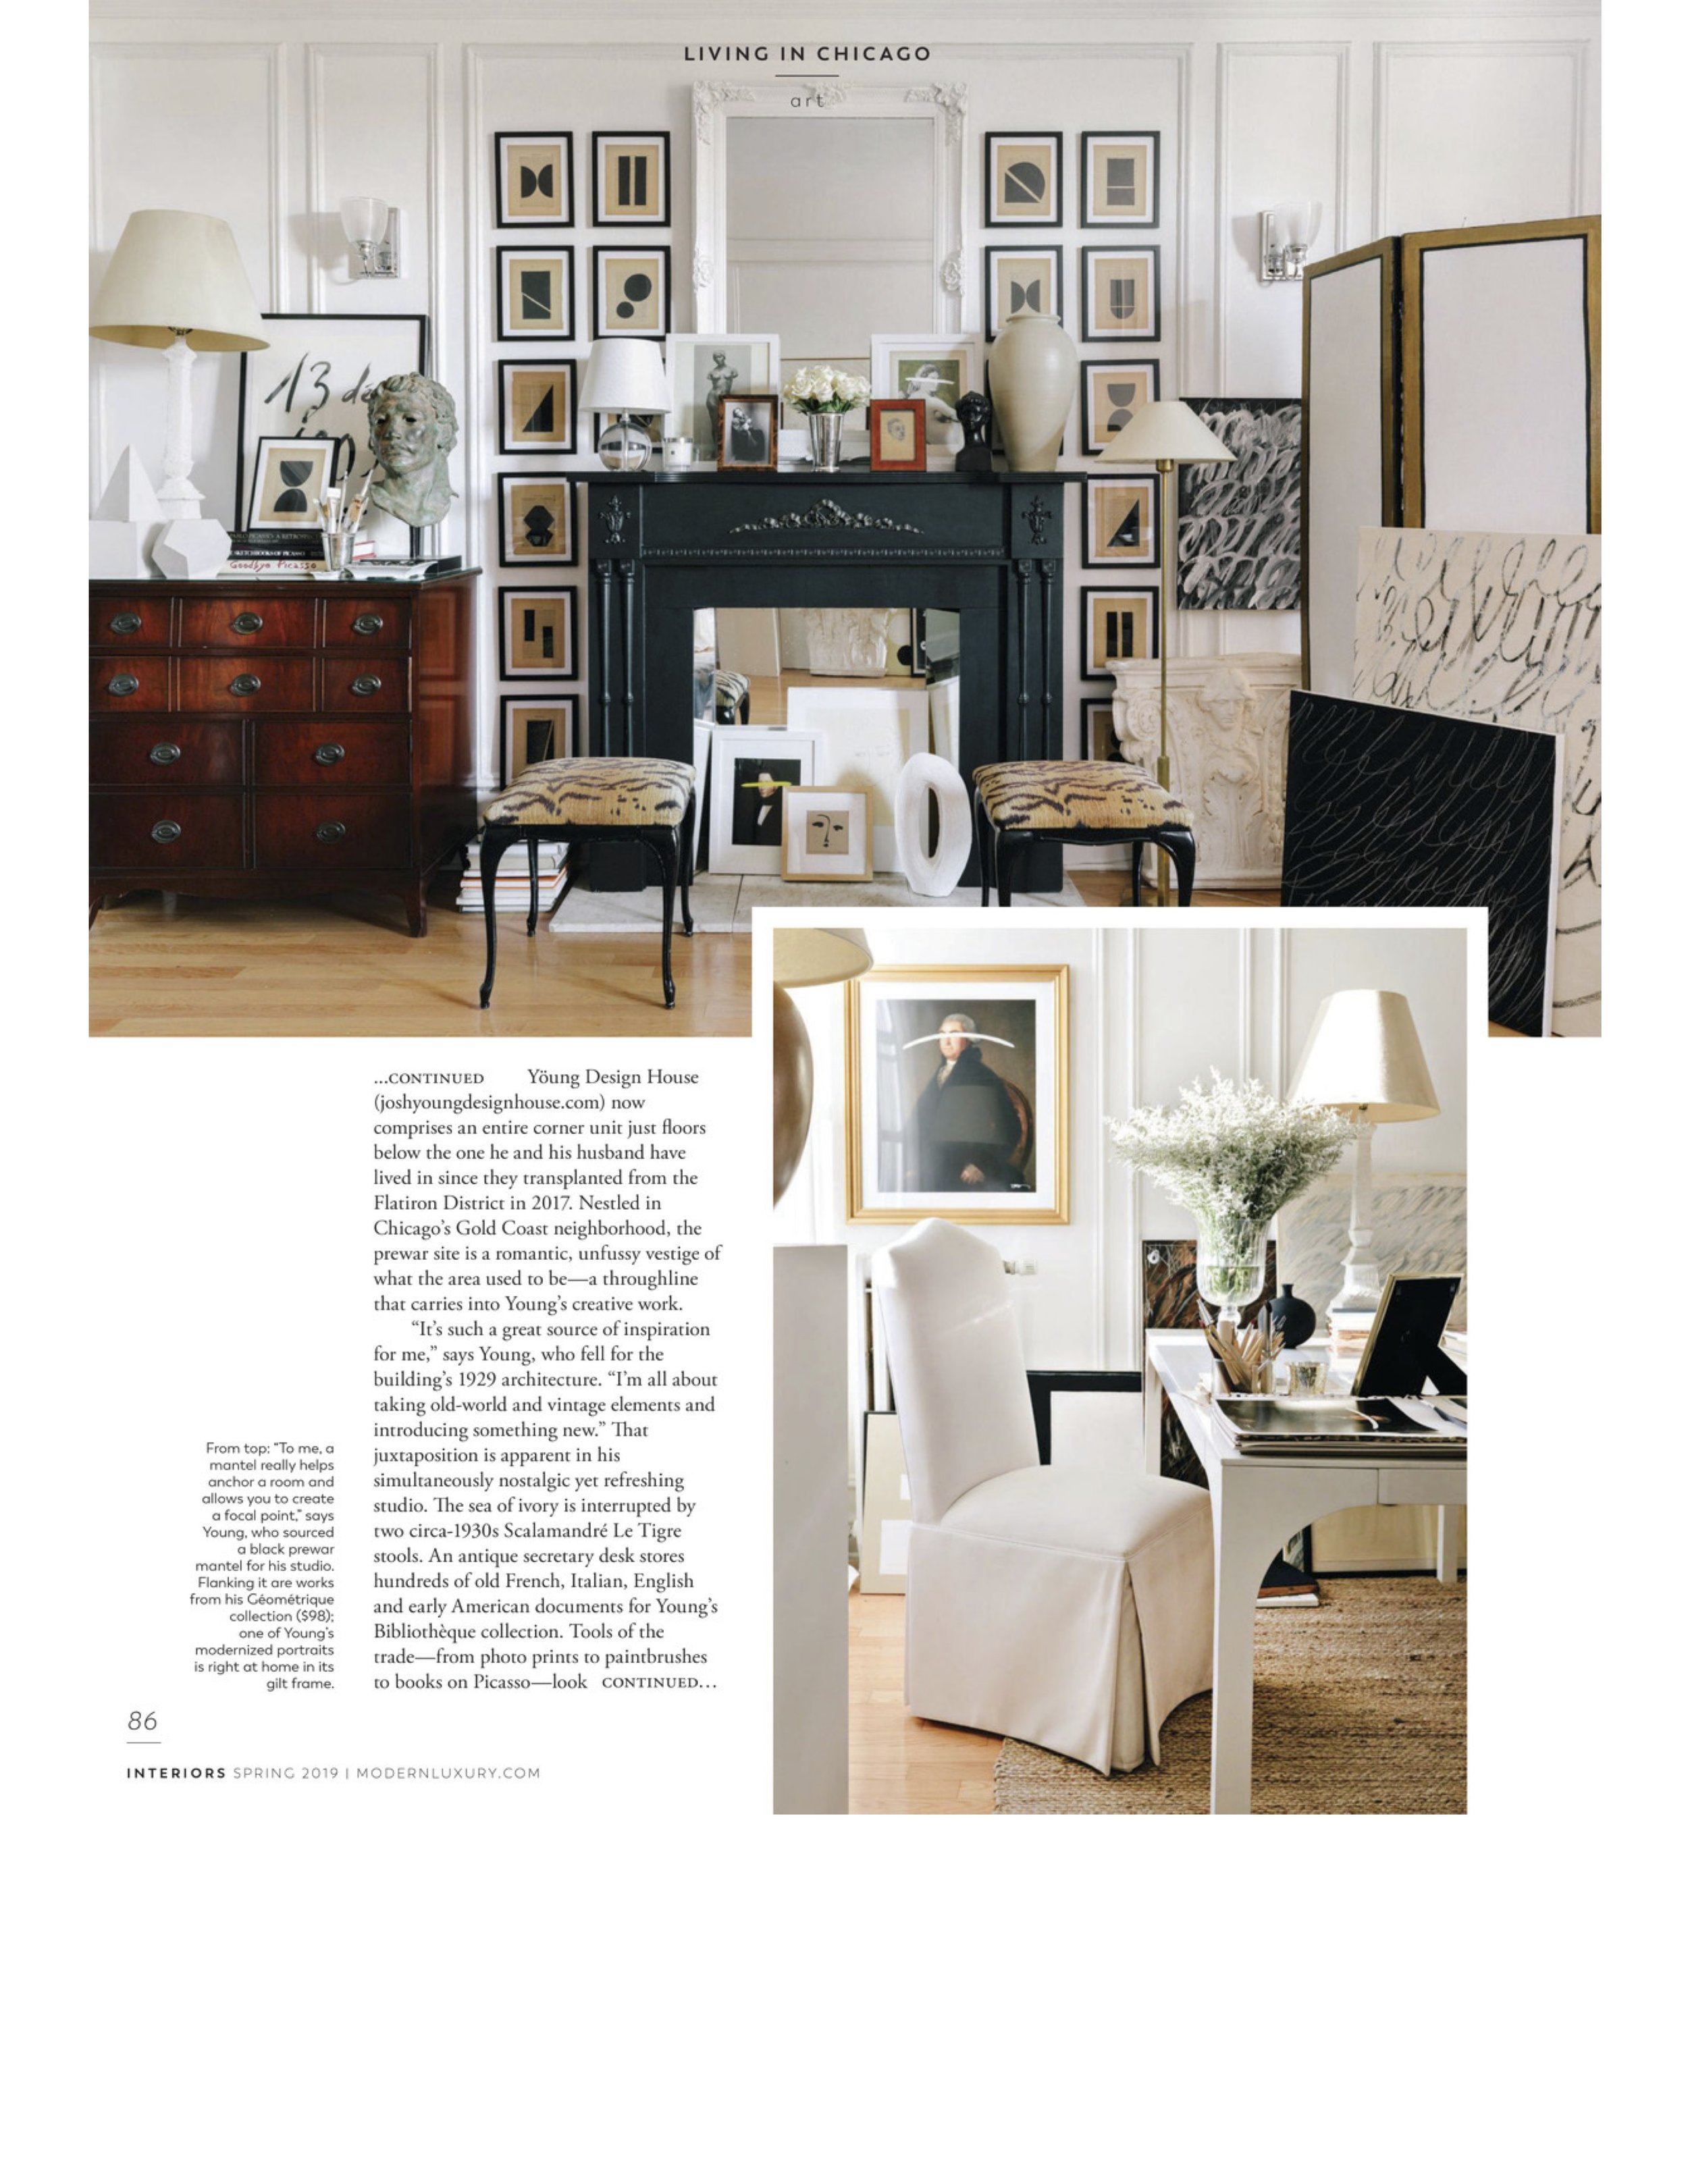 5 Modern Luxury Interiors Chicago Digital Edition | Modern Luxury.jpg